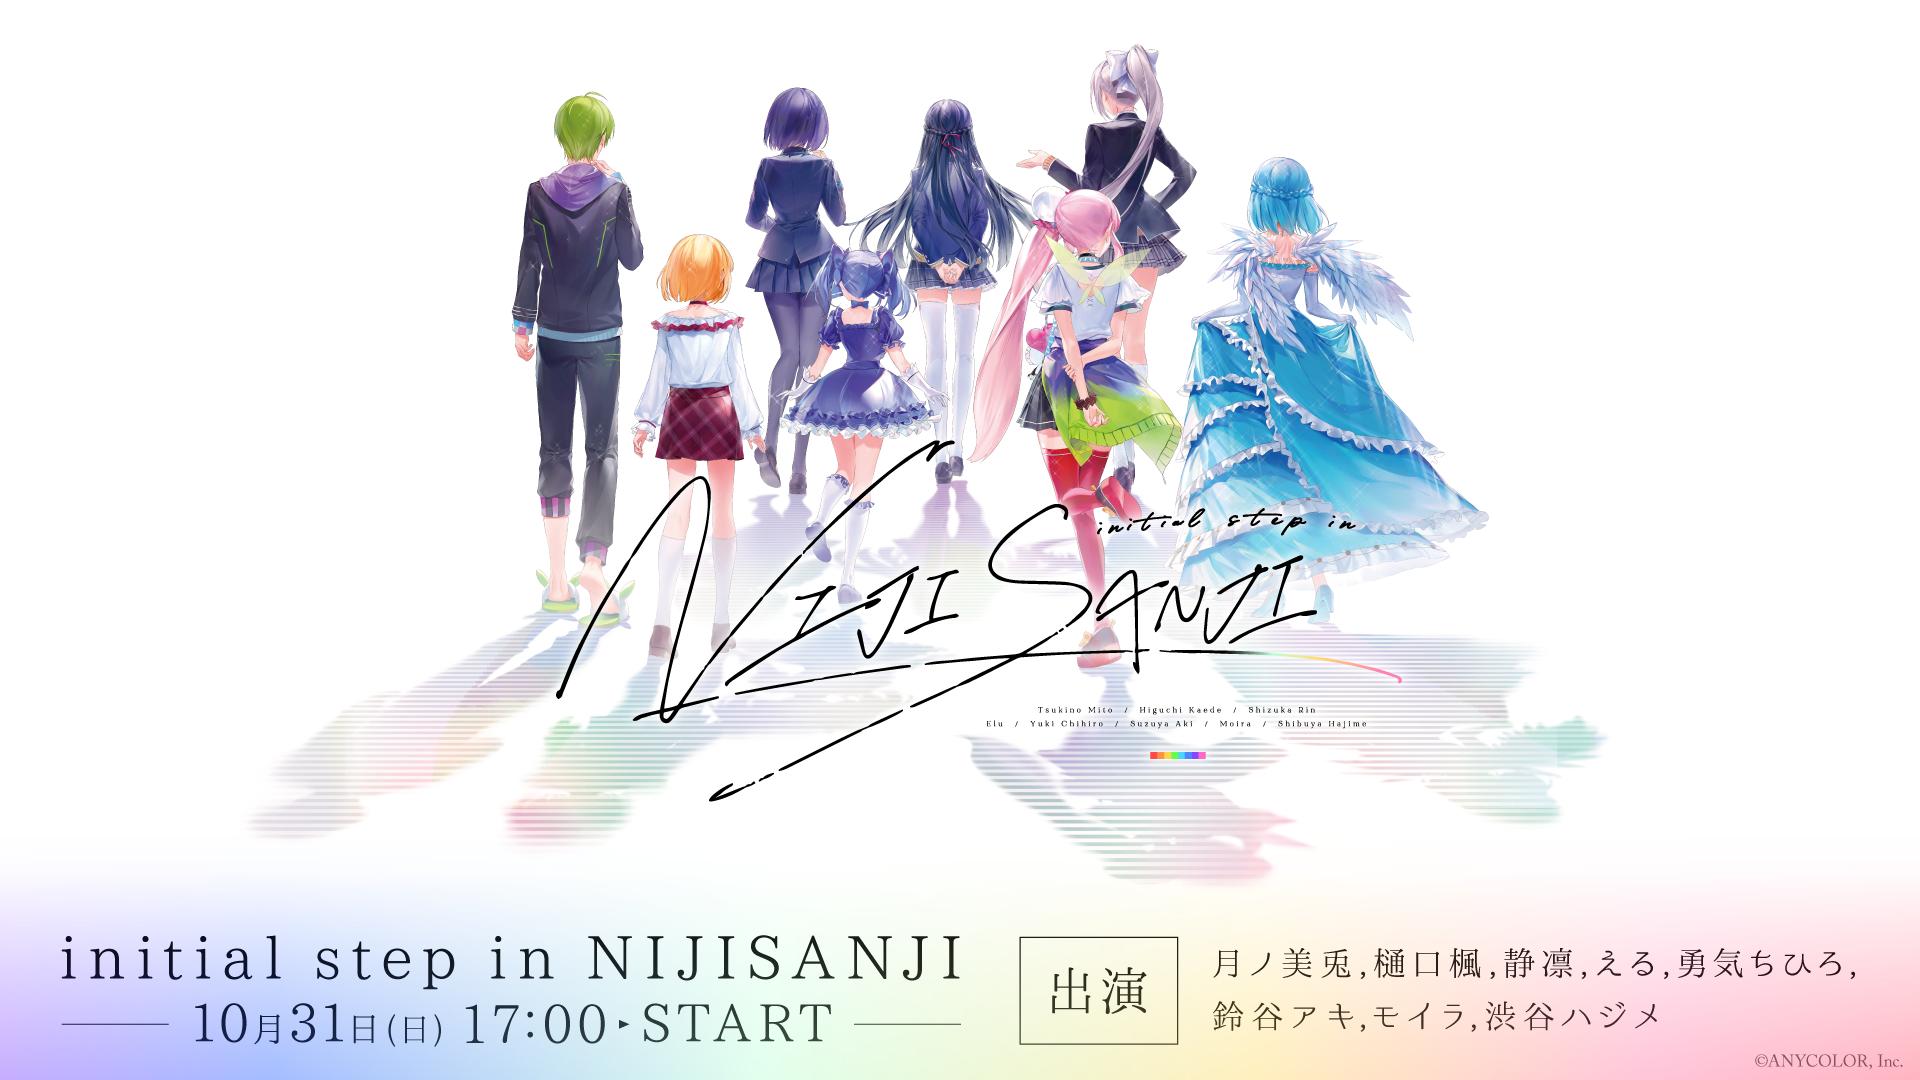 【FC先行チケット受付中!!】initial step in NIJISANJI